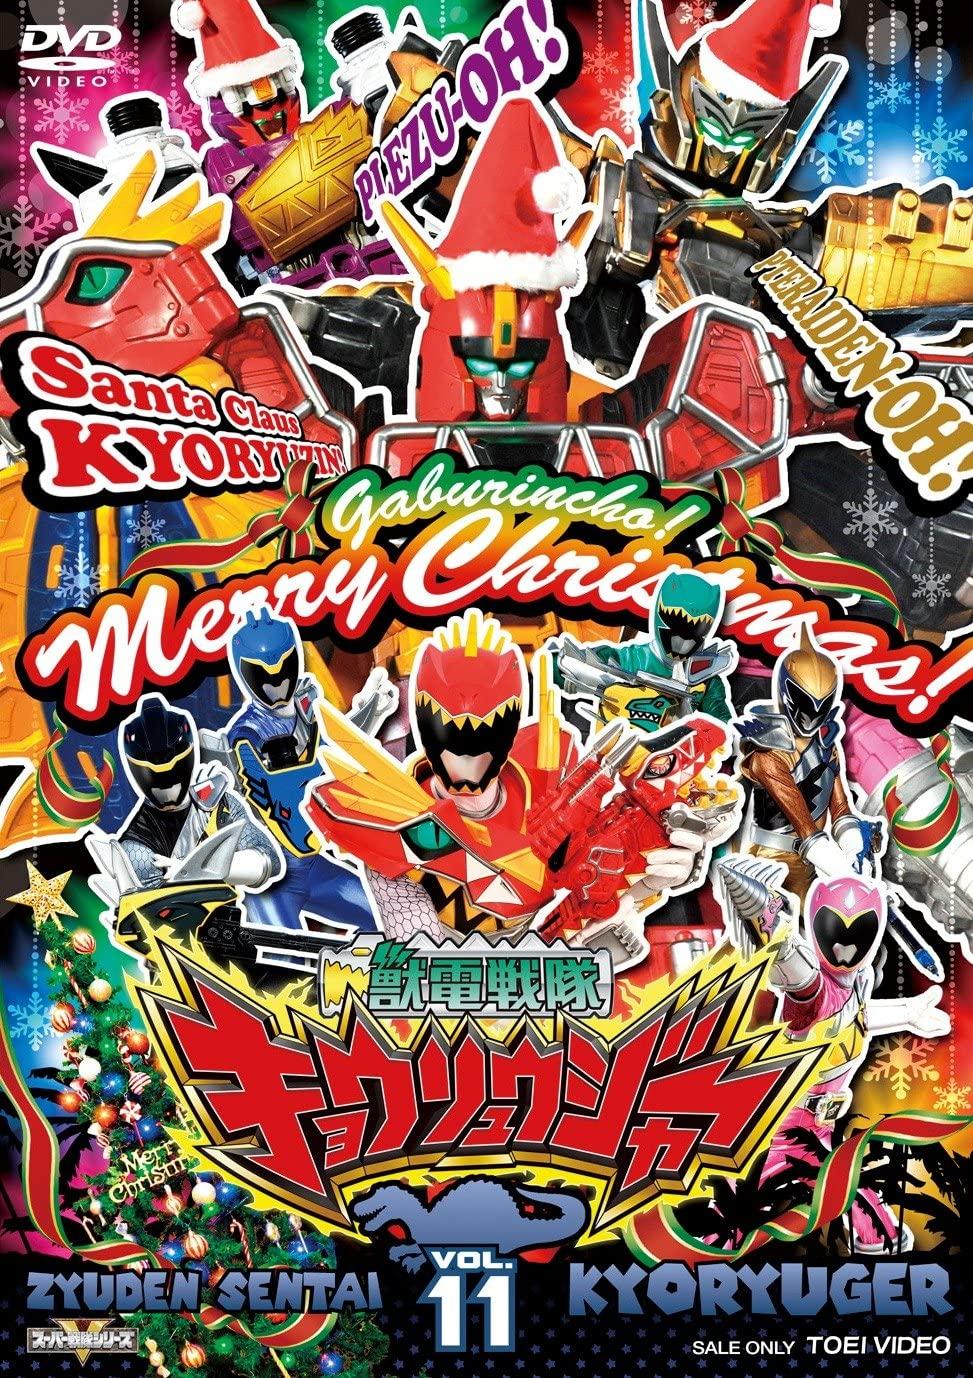 File:Kyoryuger DVD Vol 11.jpg